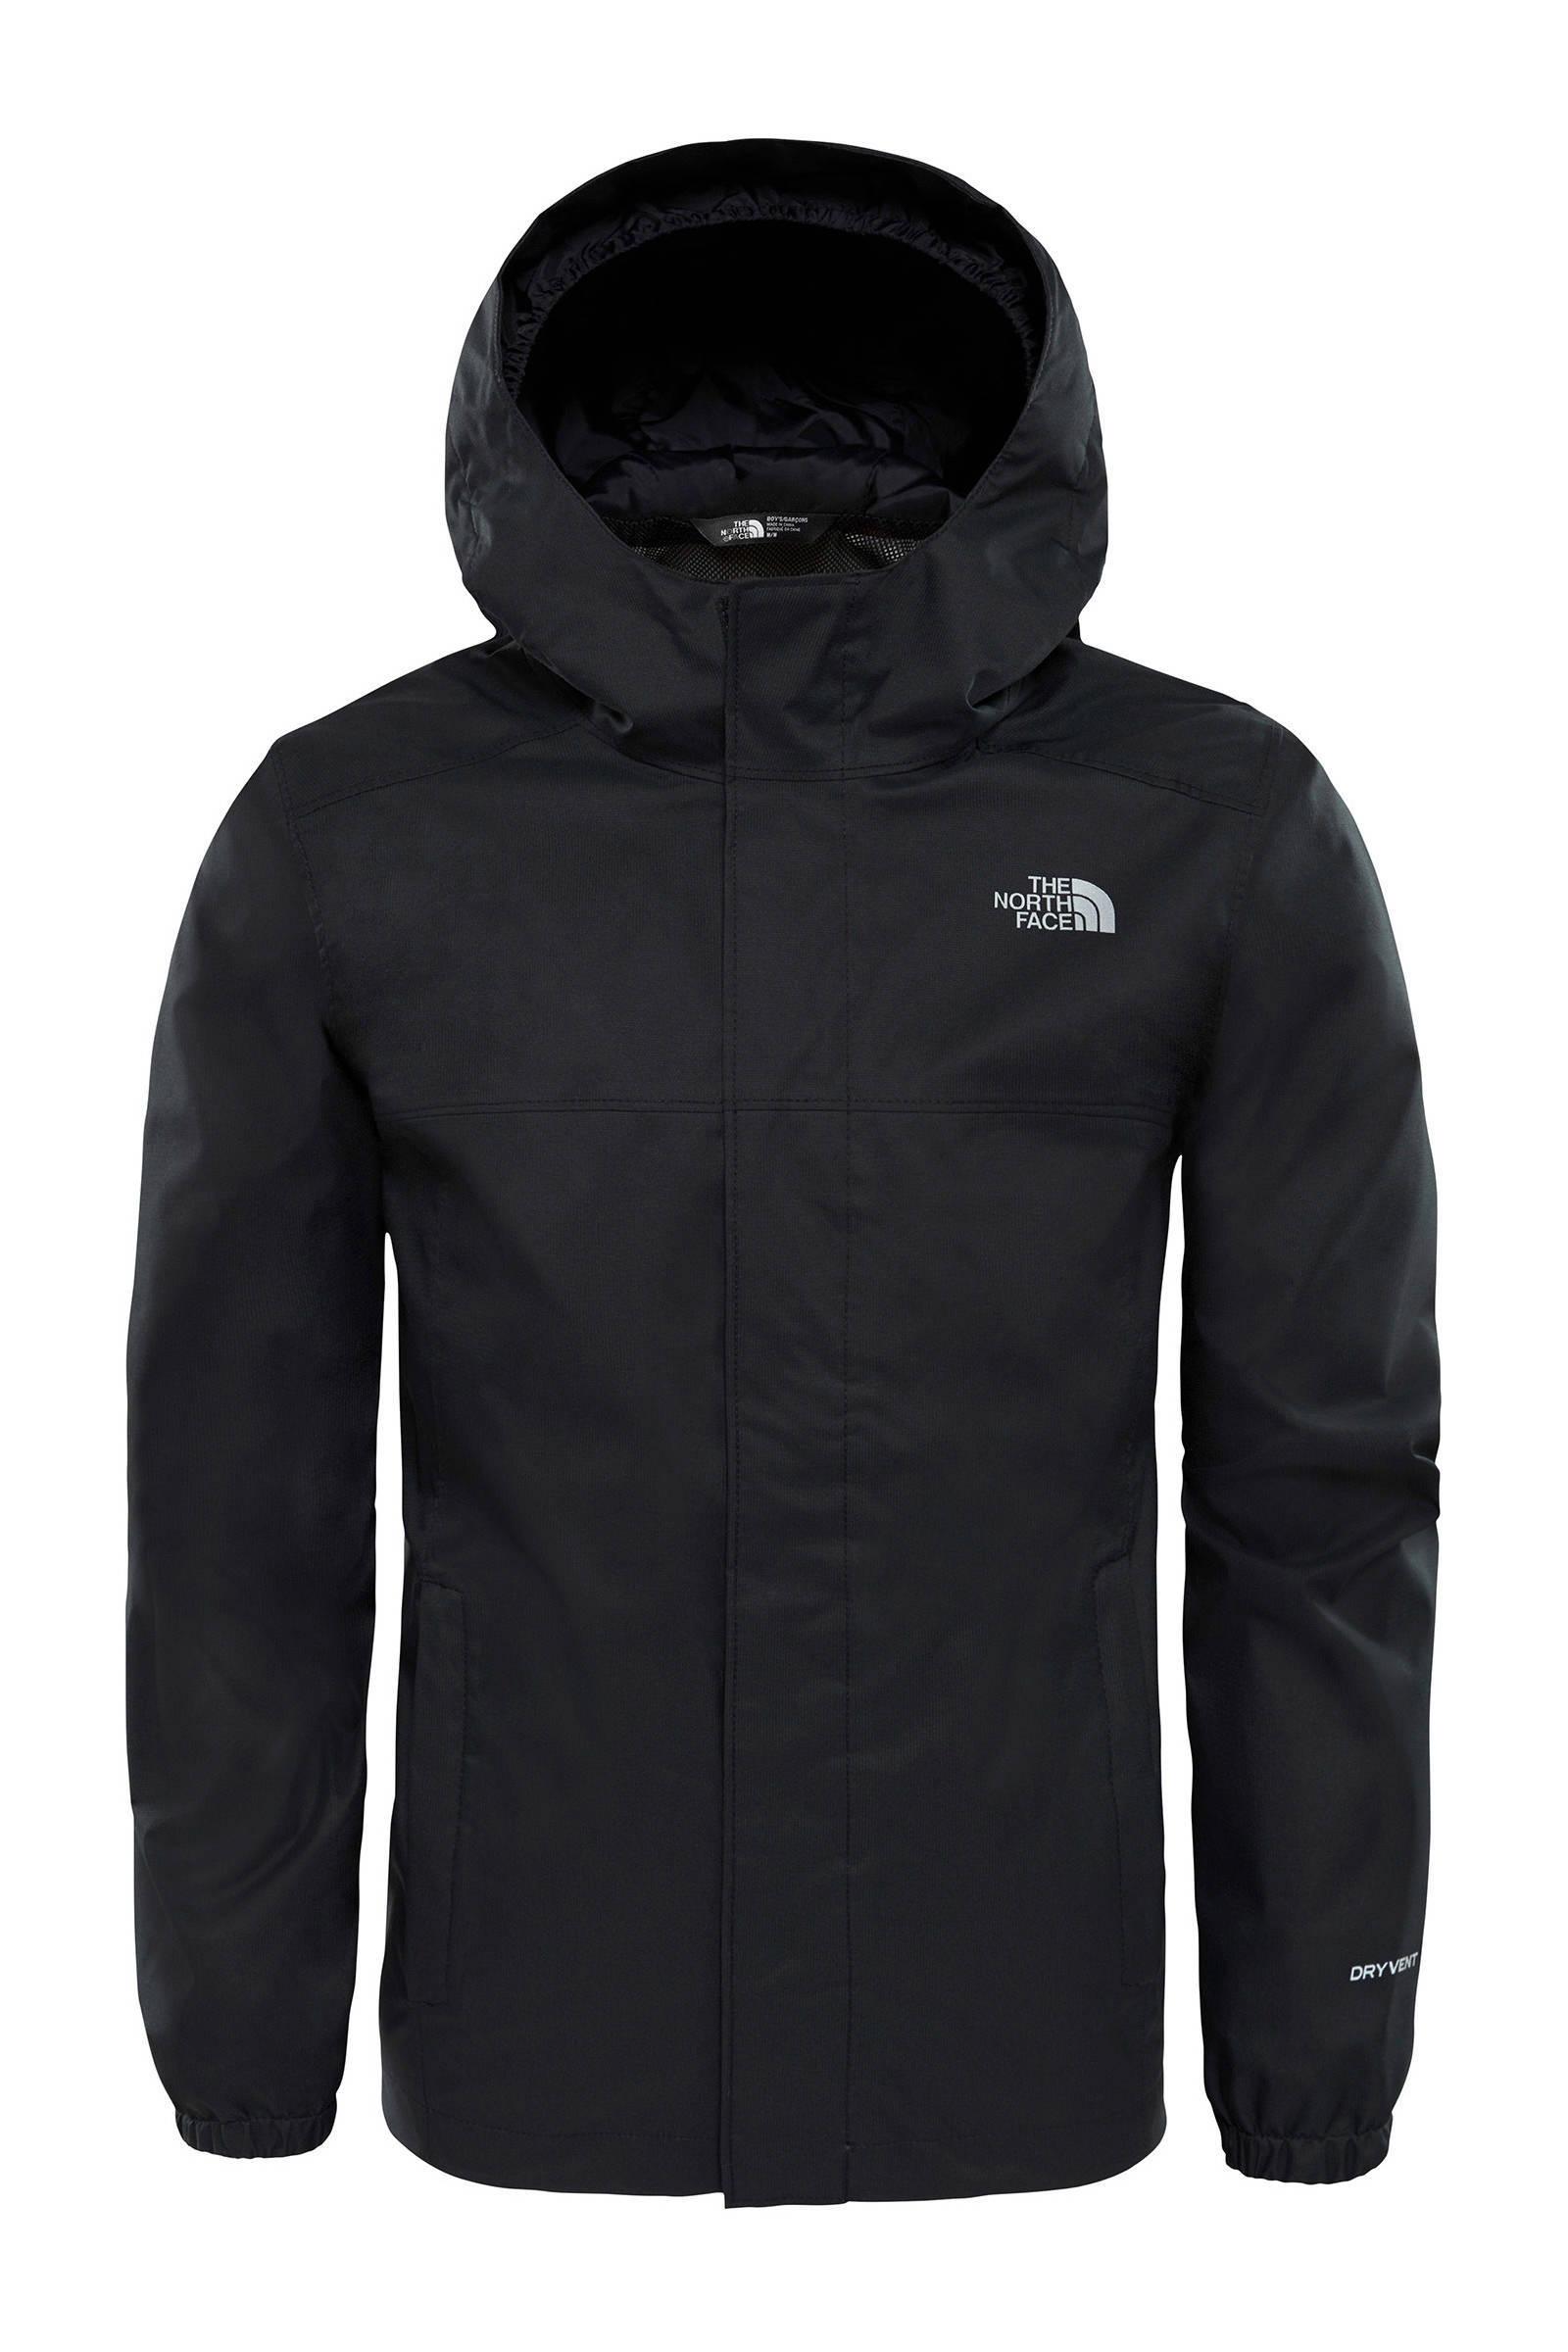 The North Face jas Resolve Reflective zwart | wehkamp